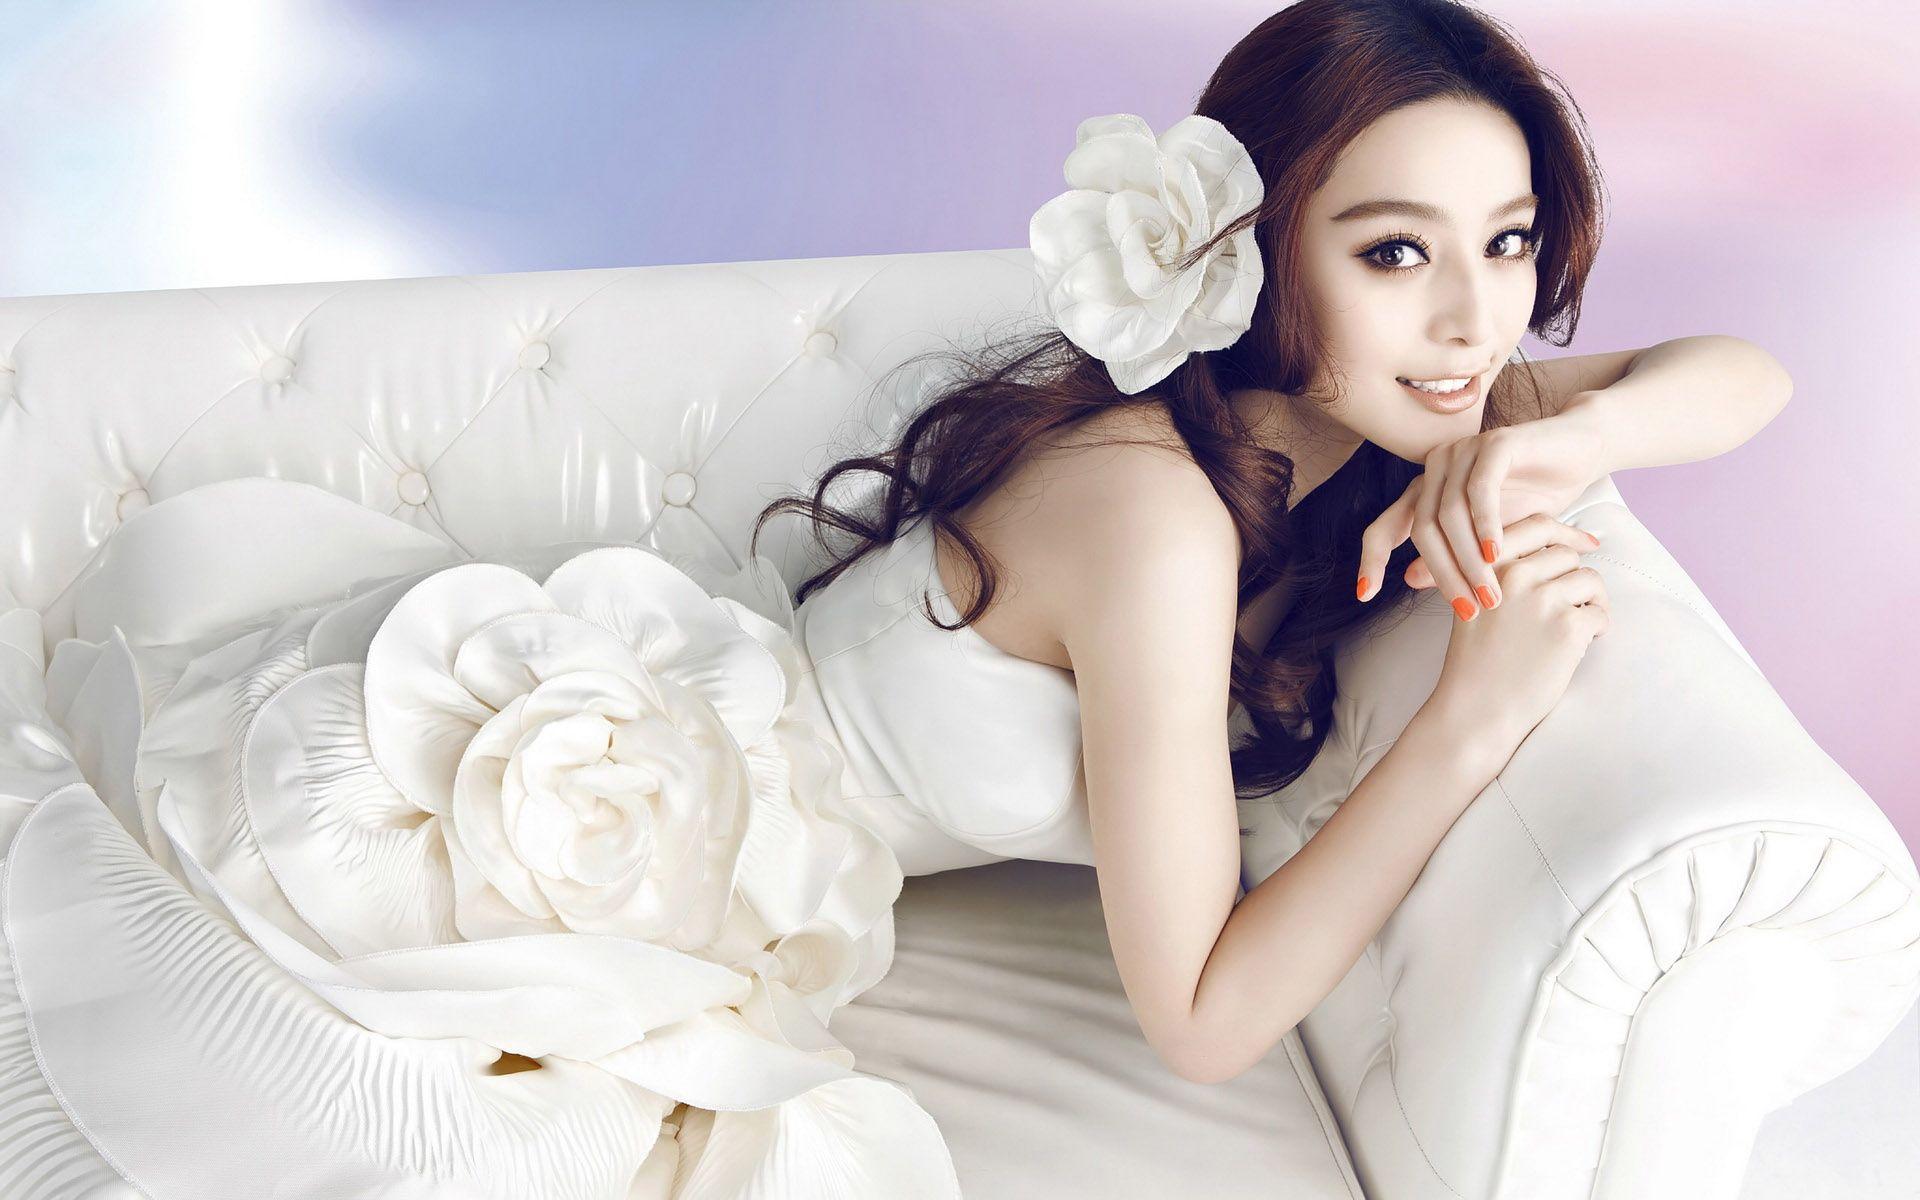 fan-bingbing-sofa-white-actress-asian-wedding-wedding-dress.jpg ...